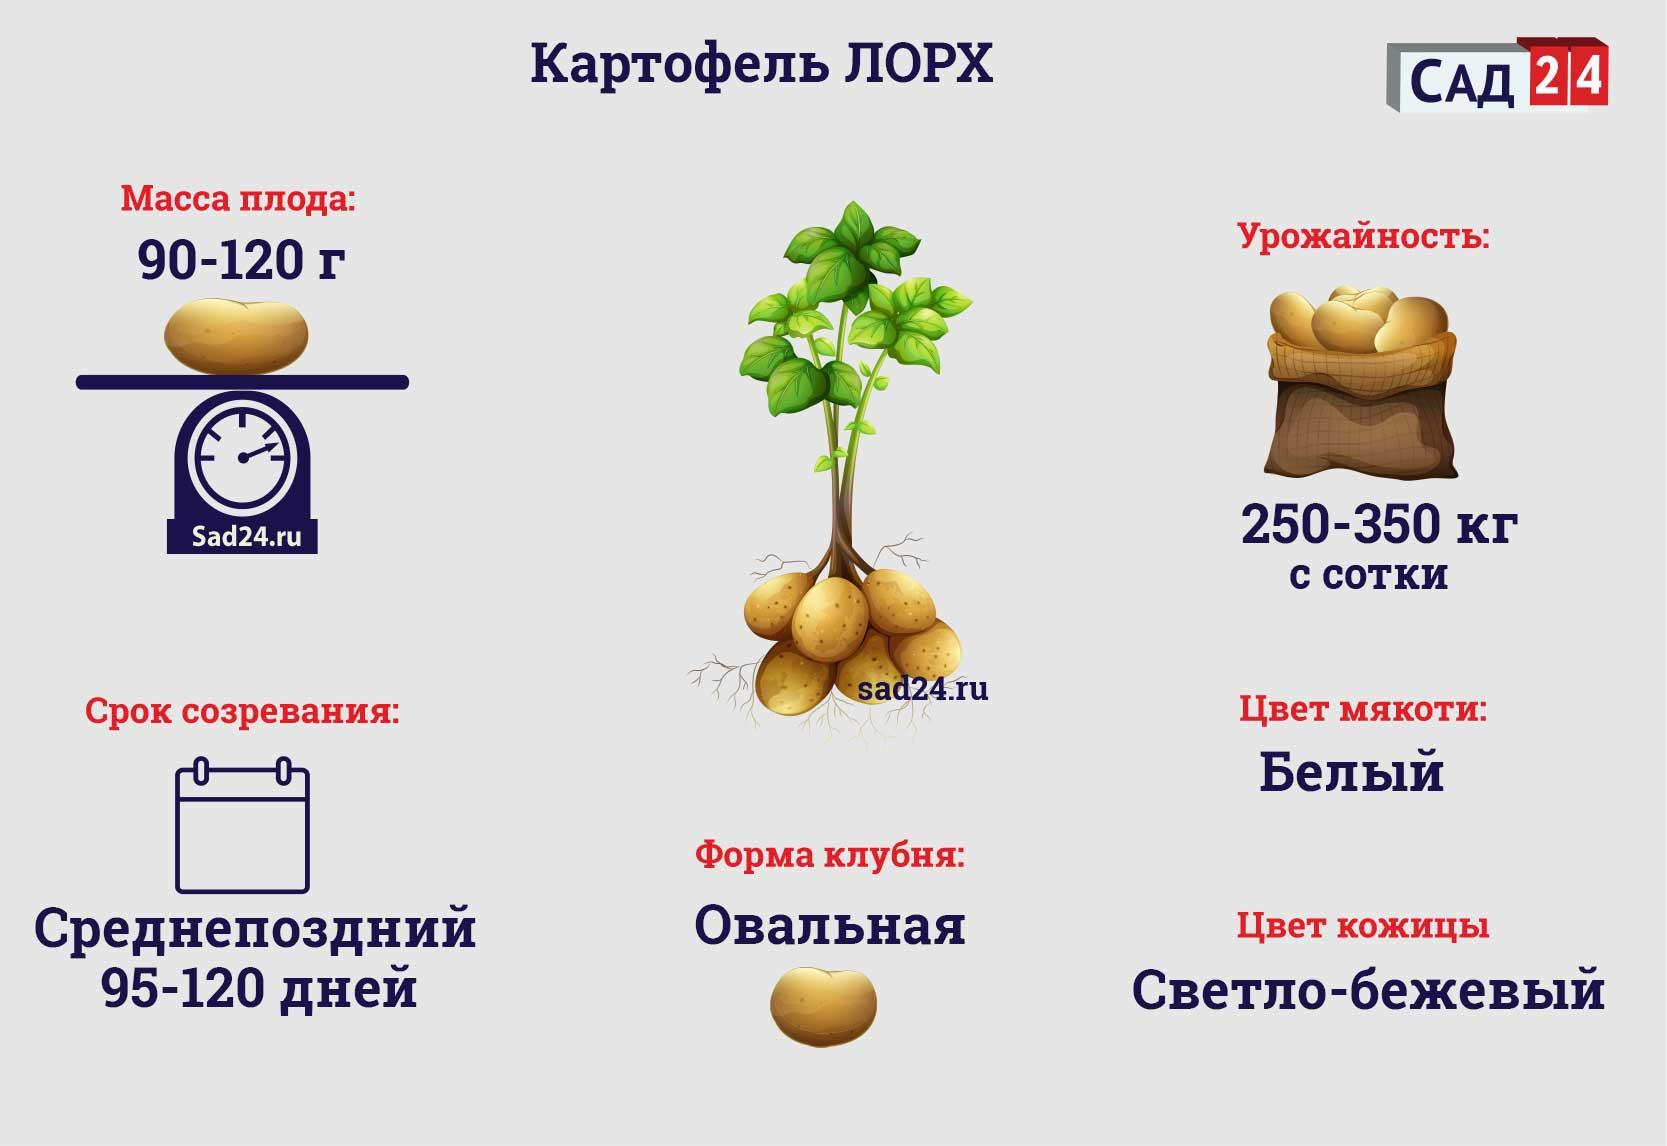 Лорх - https://sad24.ru